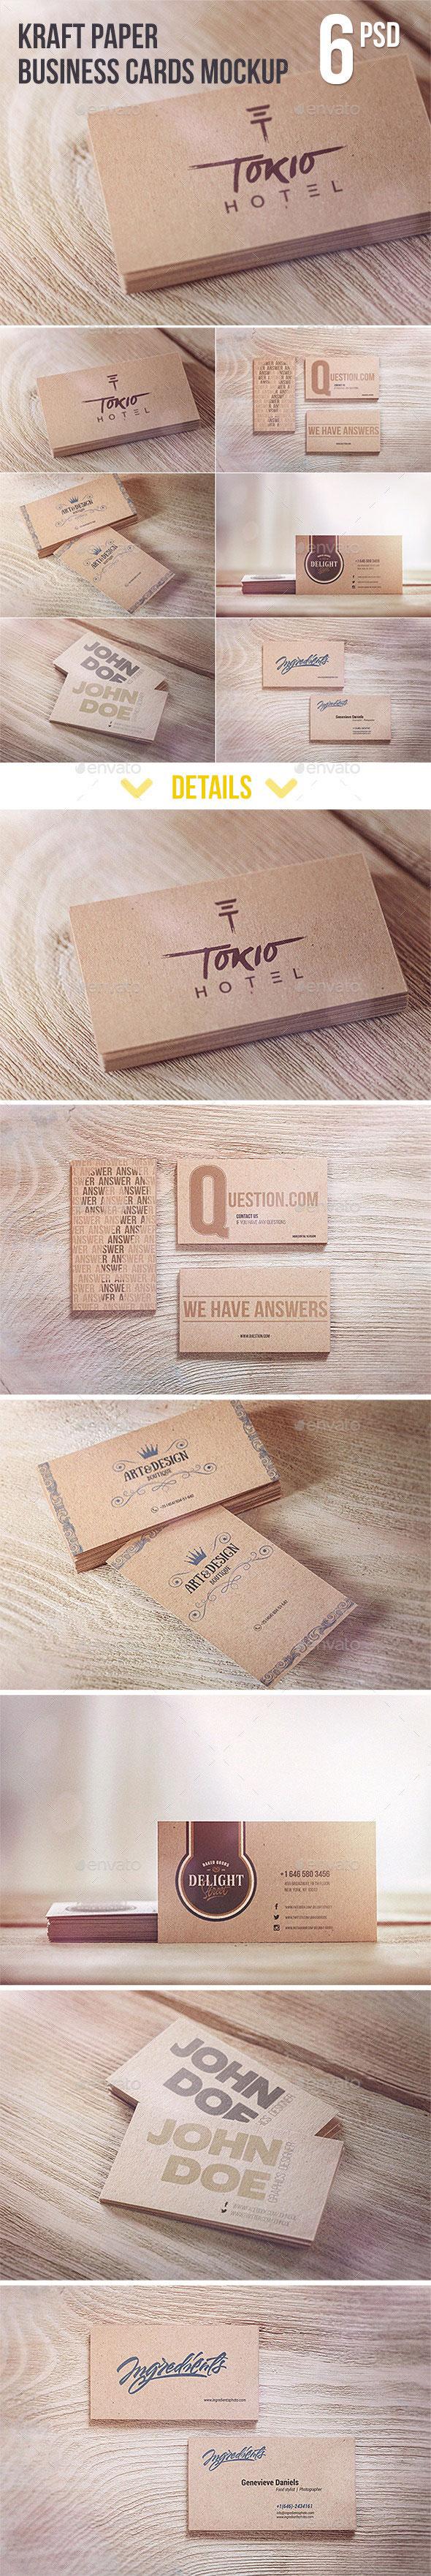 Graphicriver-Kraft-Paper-Business-Cards-MockUp-11406178